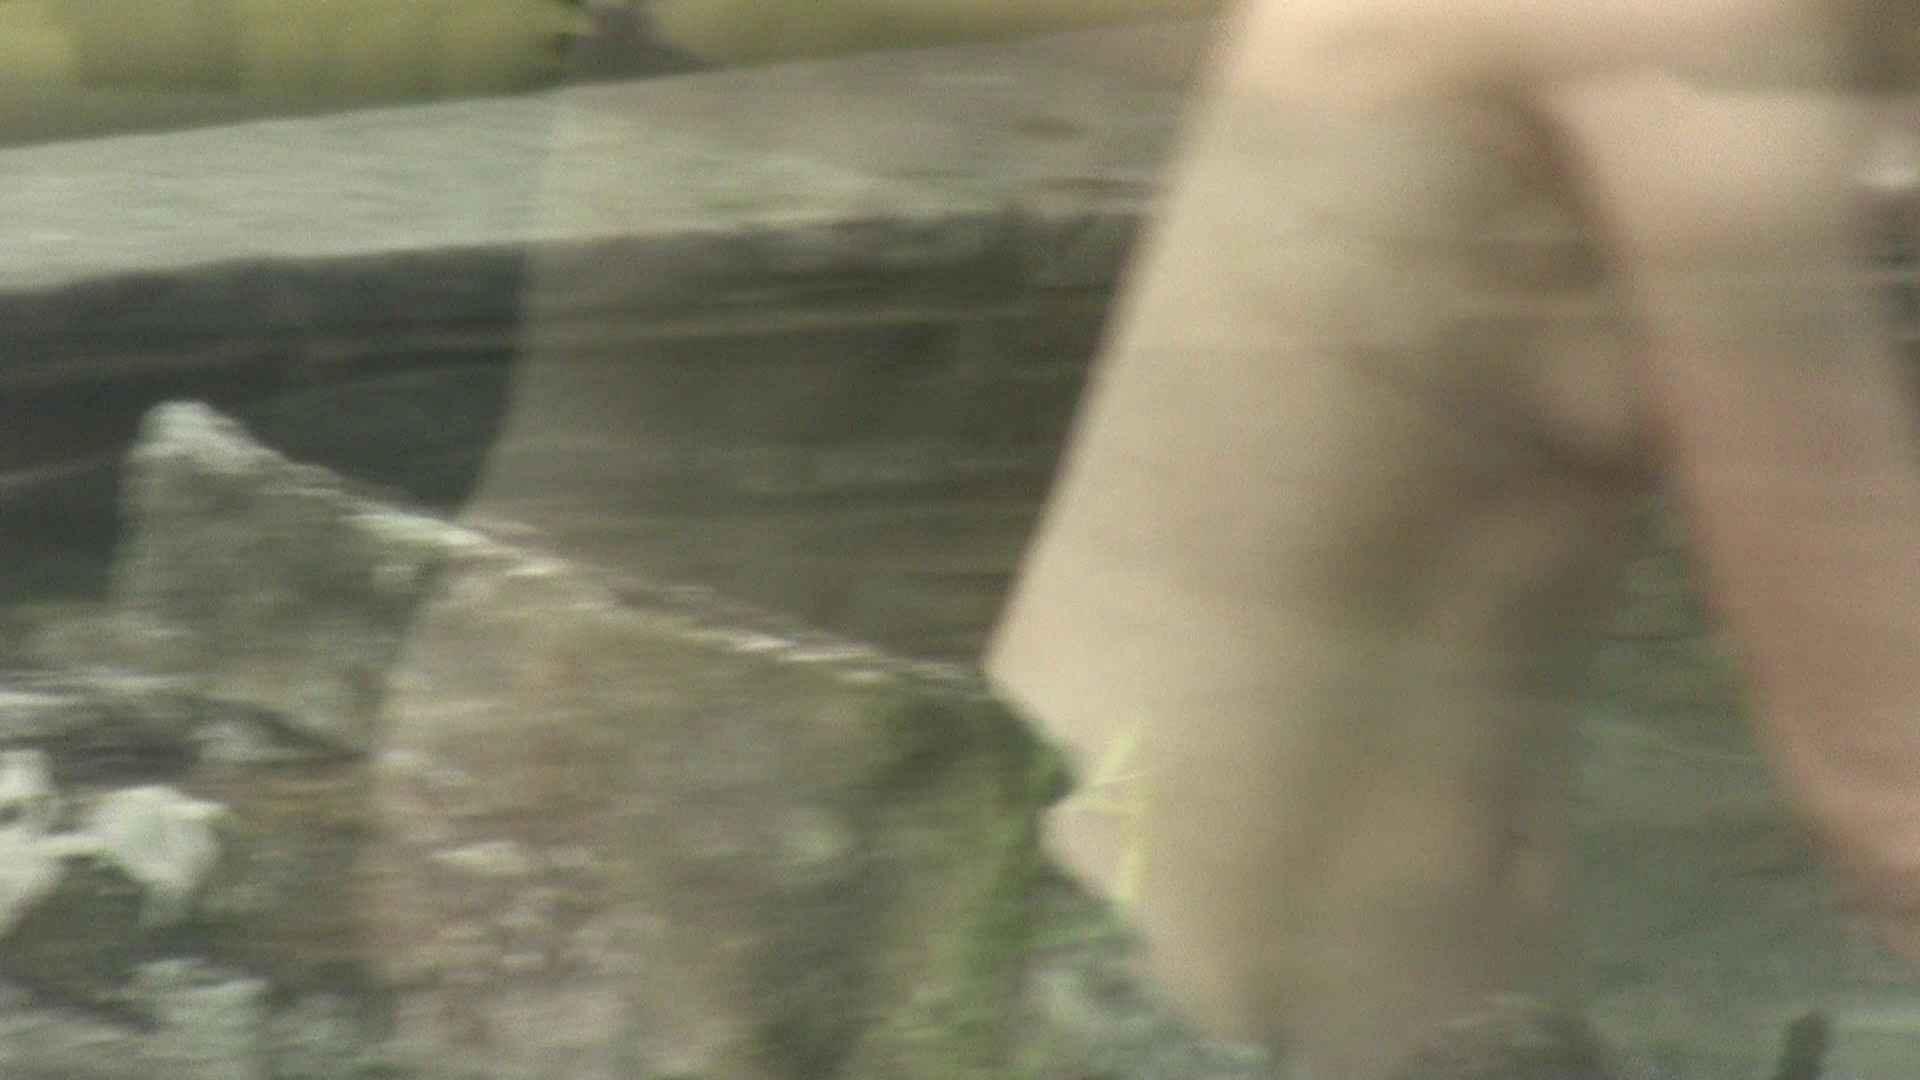 Aquaな露天風呂Vol.17【VIP】 盗撮シリーズ | 露天風呂編  98PIX 13